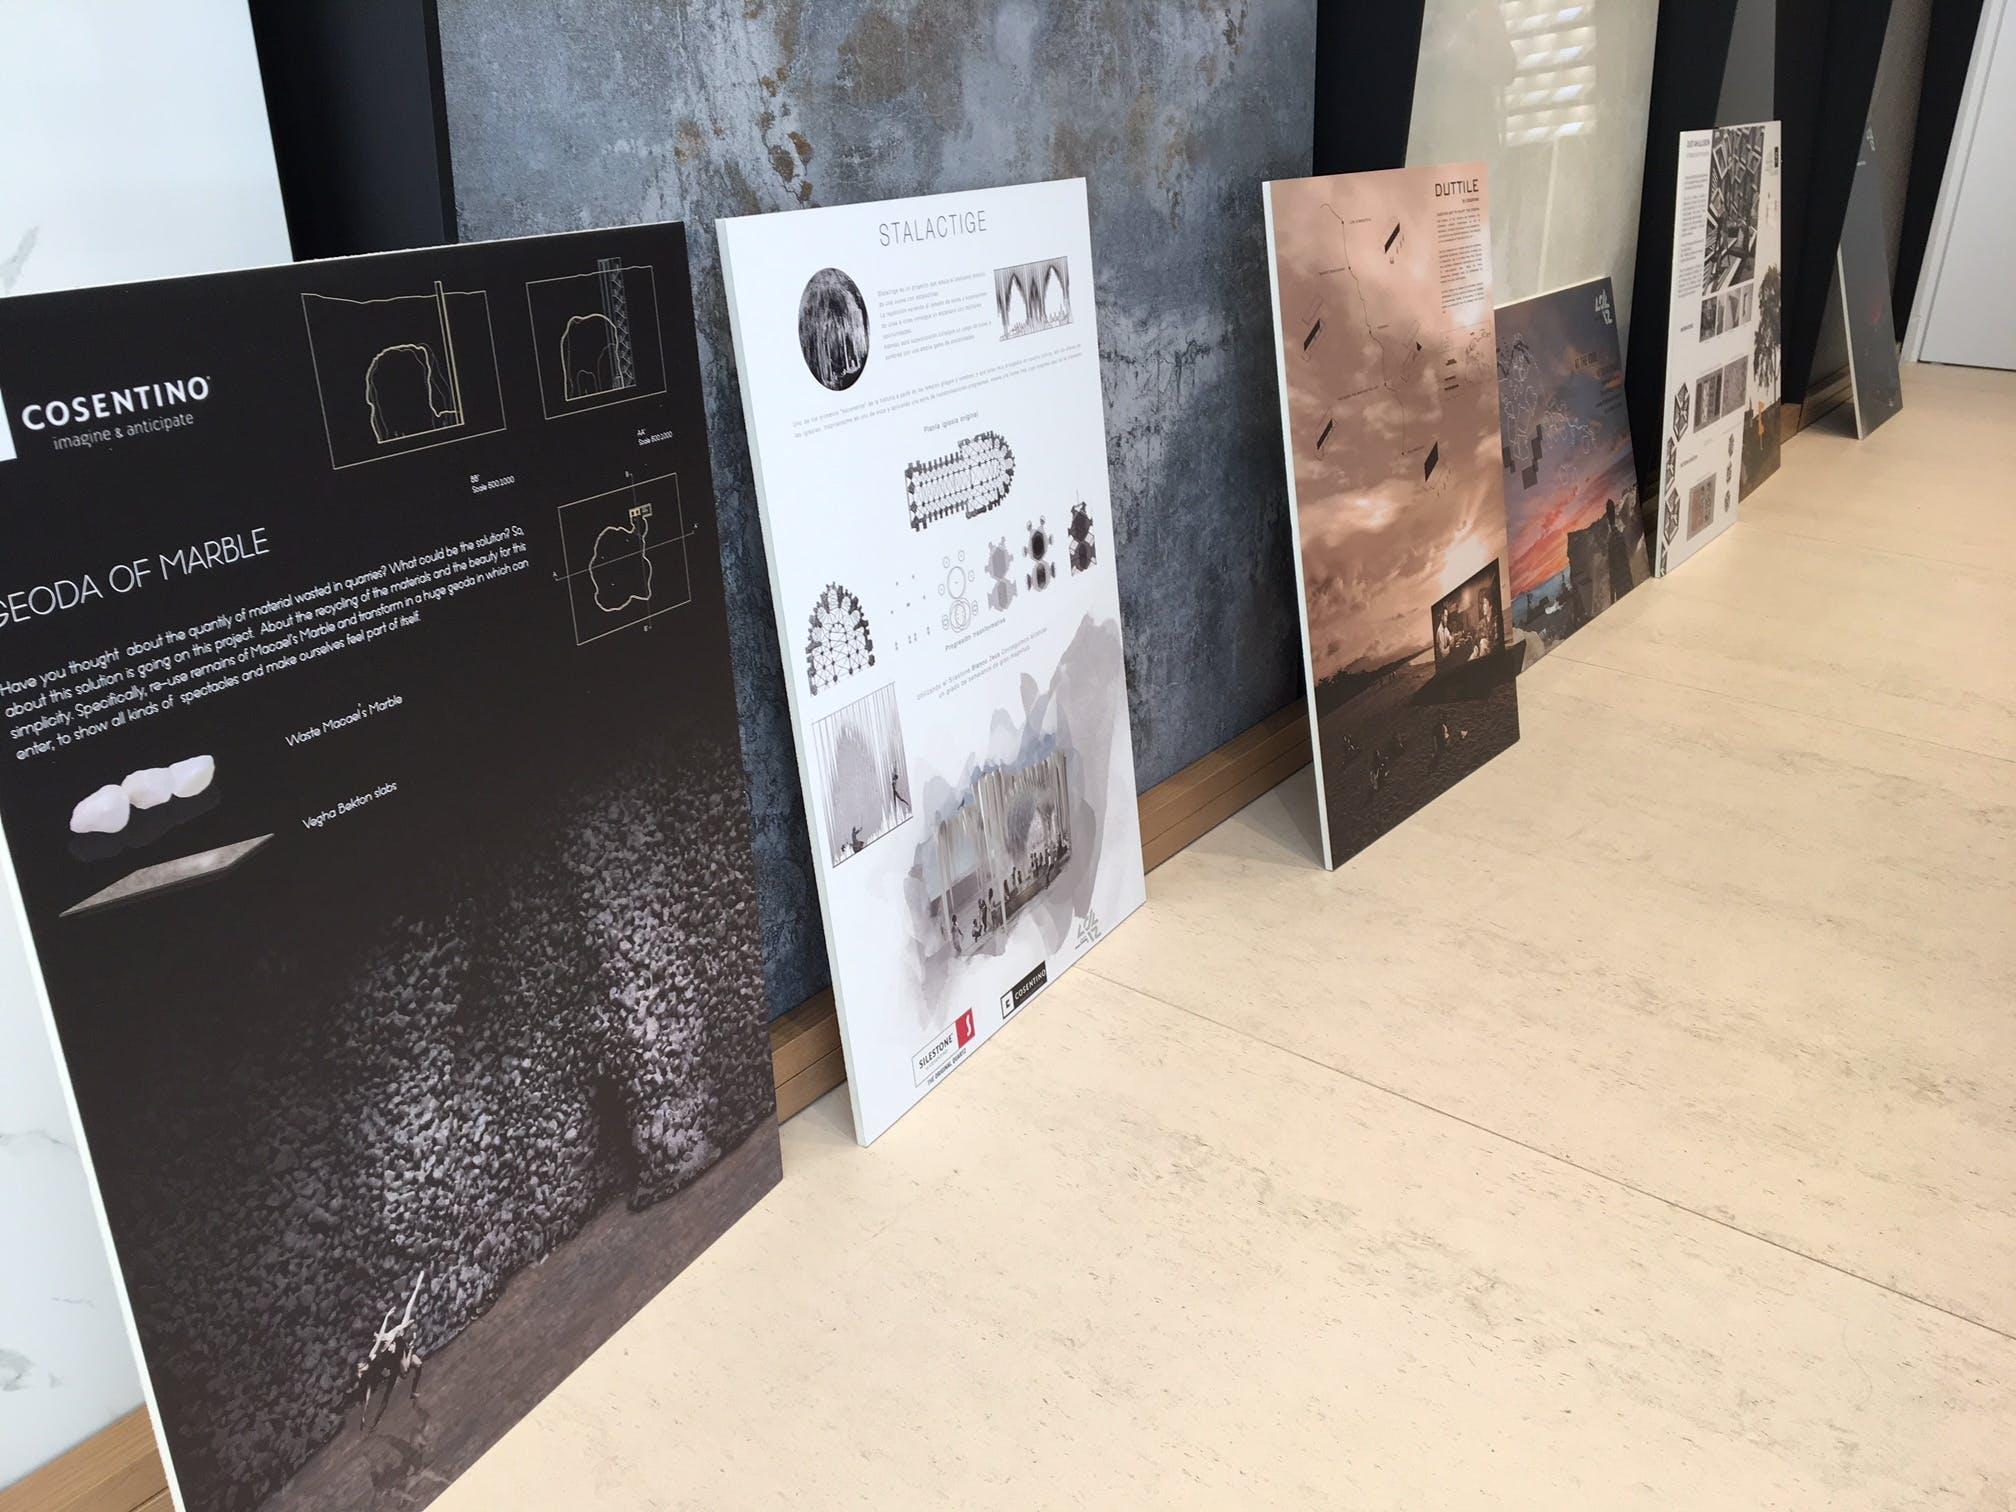 Image of Ganadores Arquitectura 2 1 in 12th Cosentino Design Challenge Winners - Cosentino